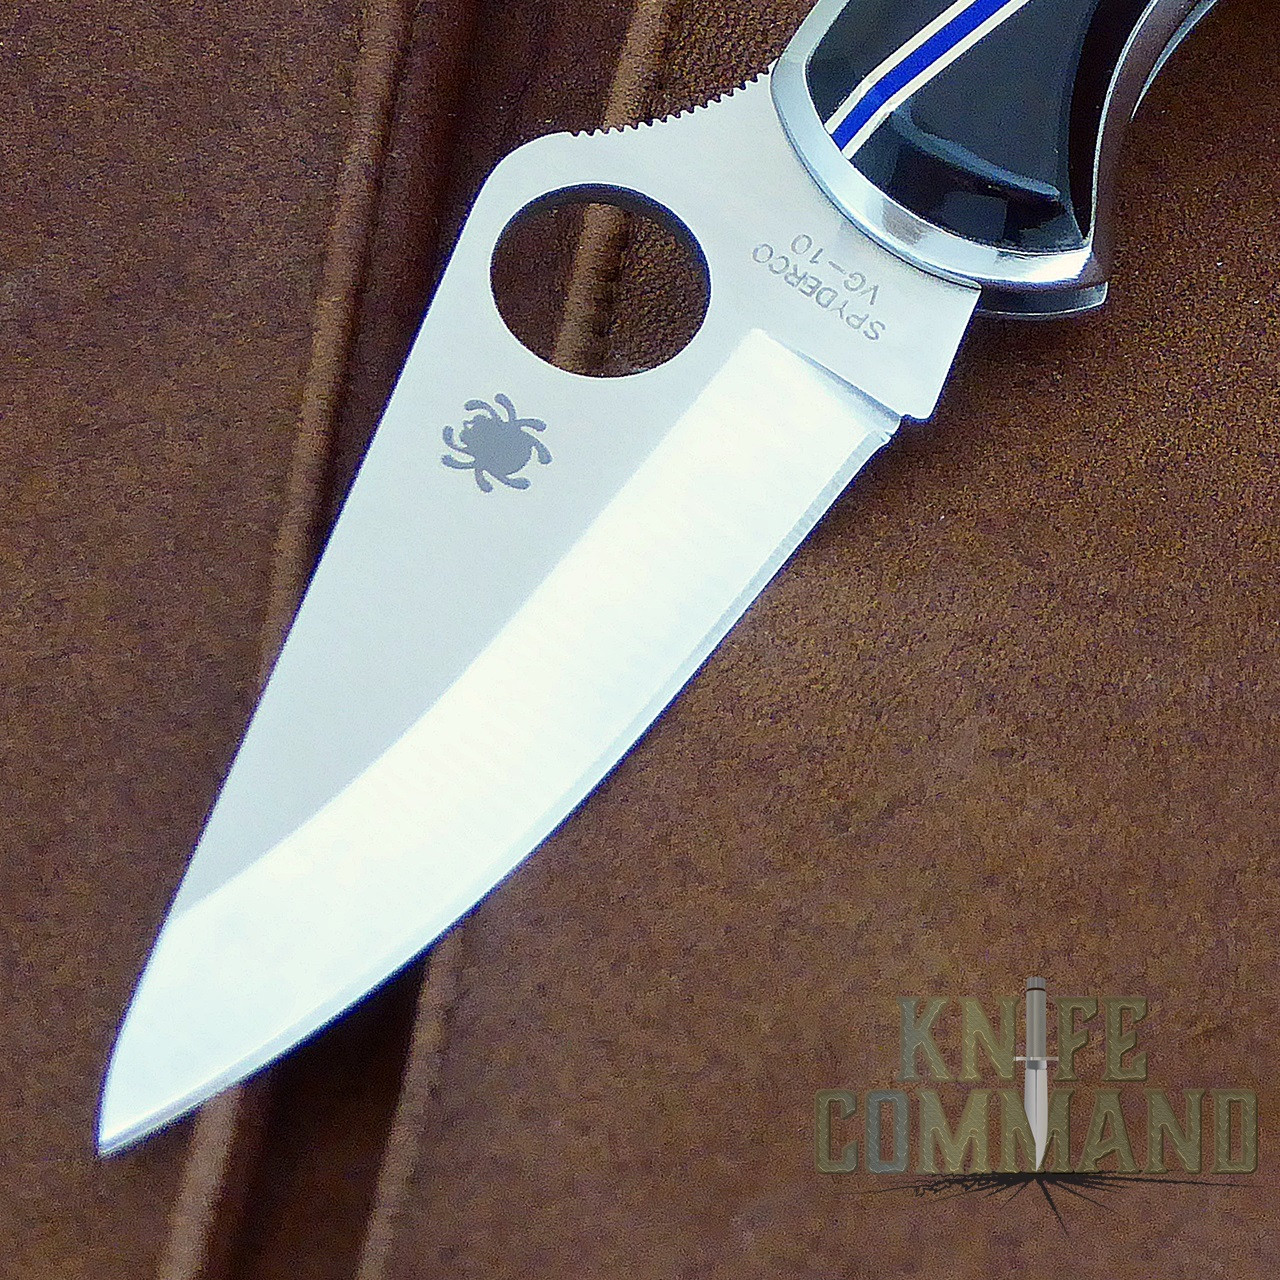 Spyderco Delica Santa Fe Stoneworks Blue Line Special Knife.  VG-10 fine edge blade.